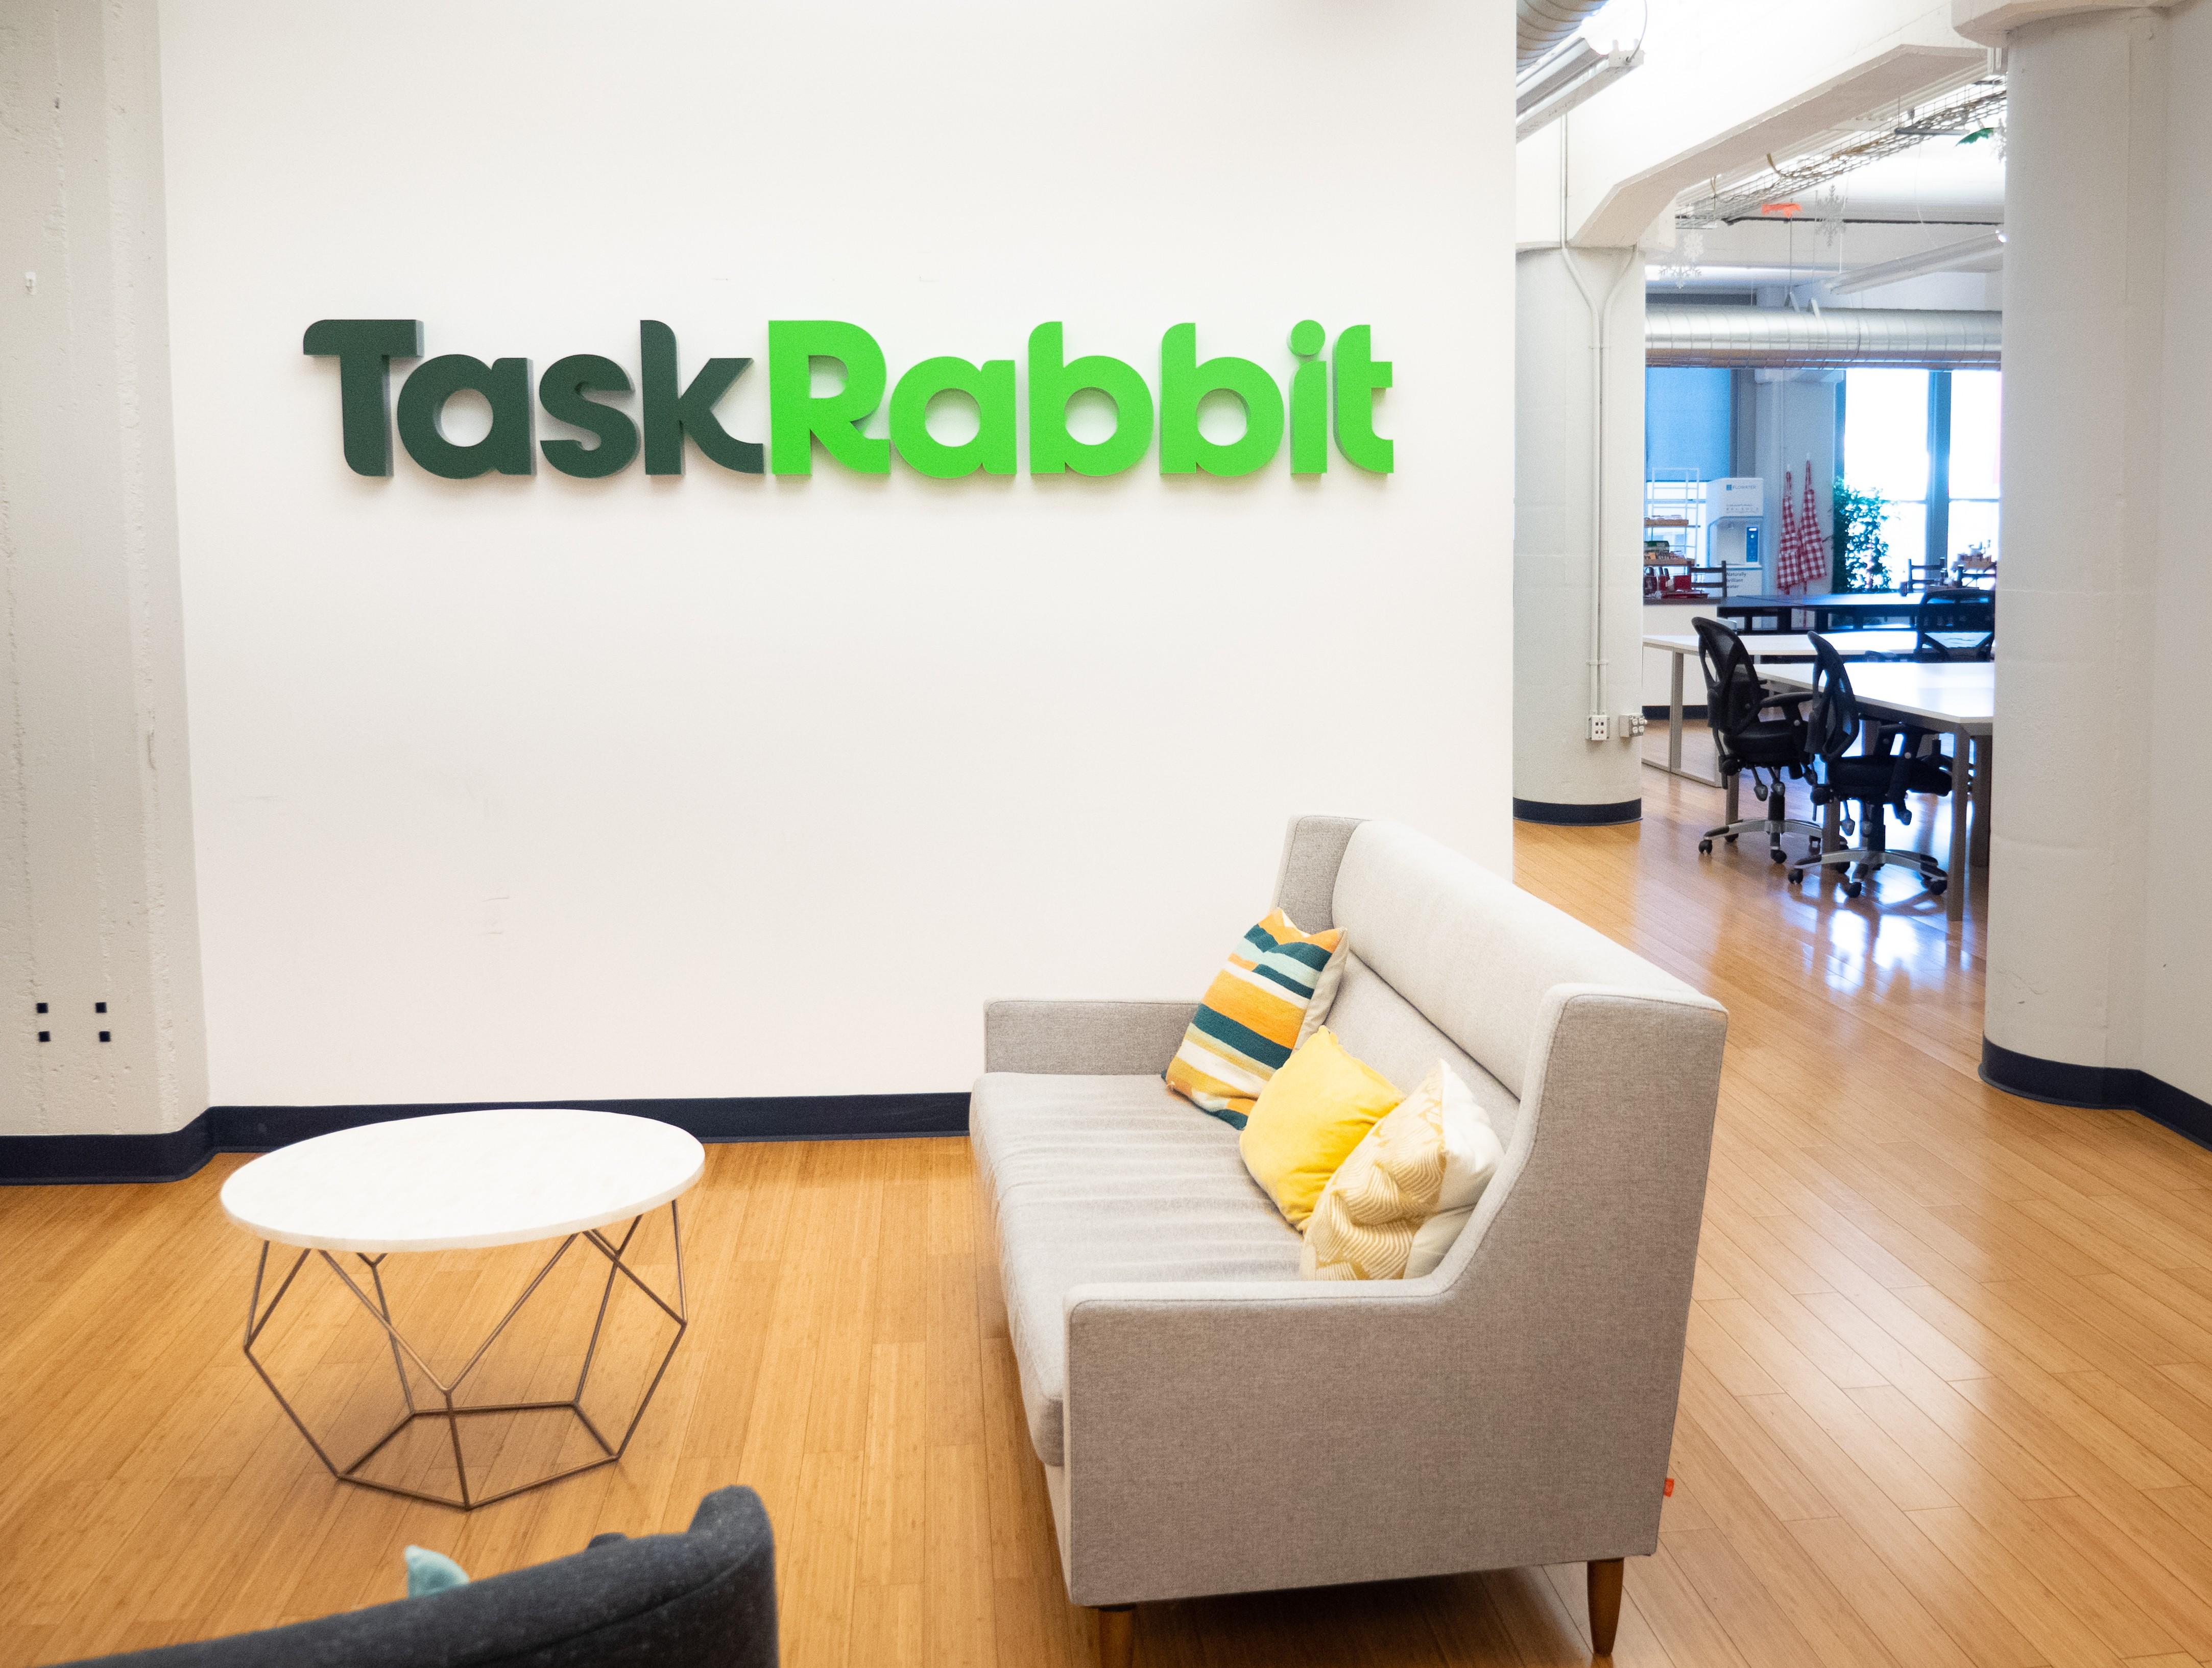 TaskRabbit | LinkedIn